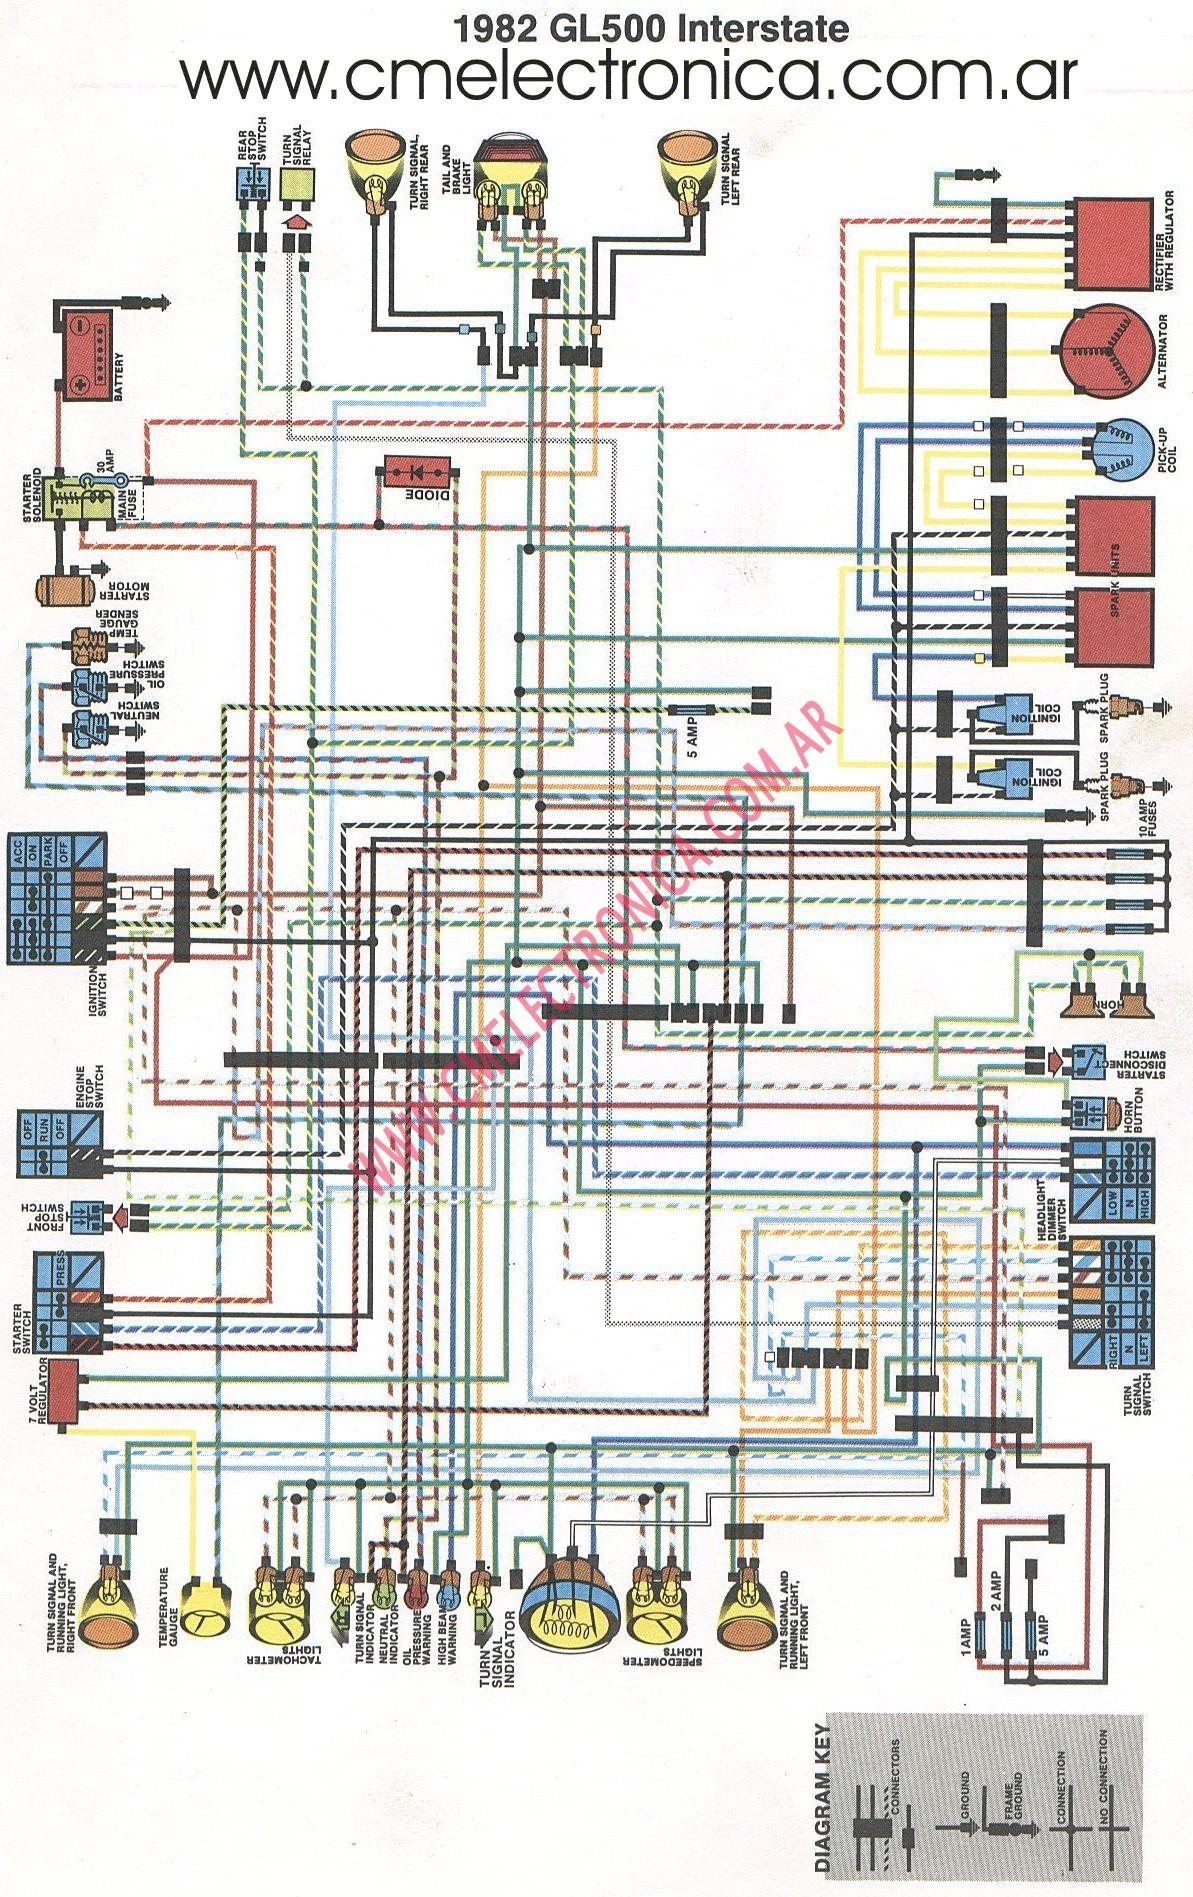 evinrude etec 250 wiring diagram 24v for trolling motors diagrama honda g 500 intersta 1982